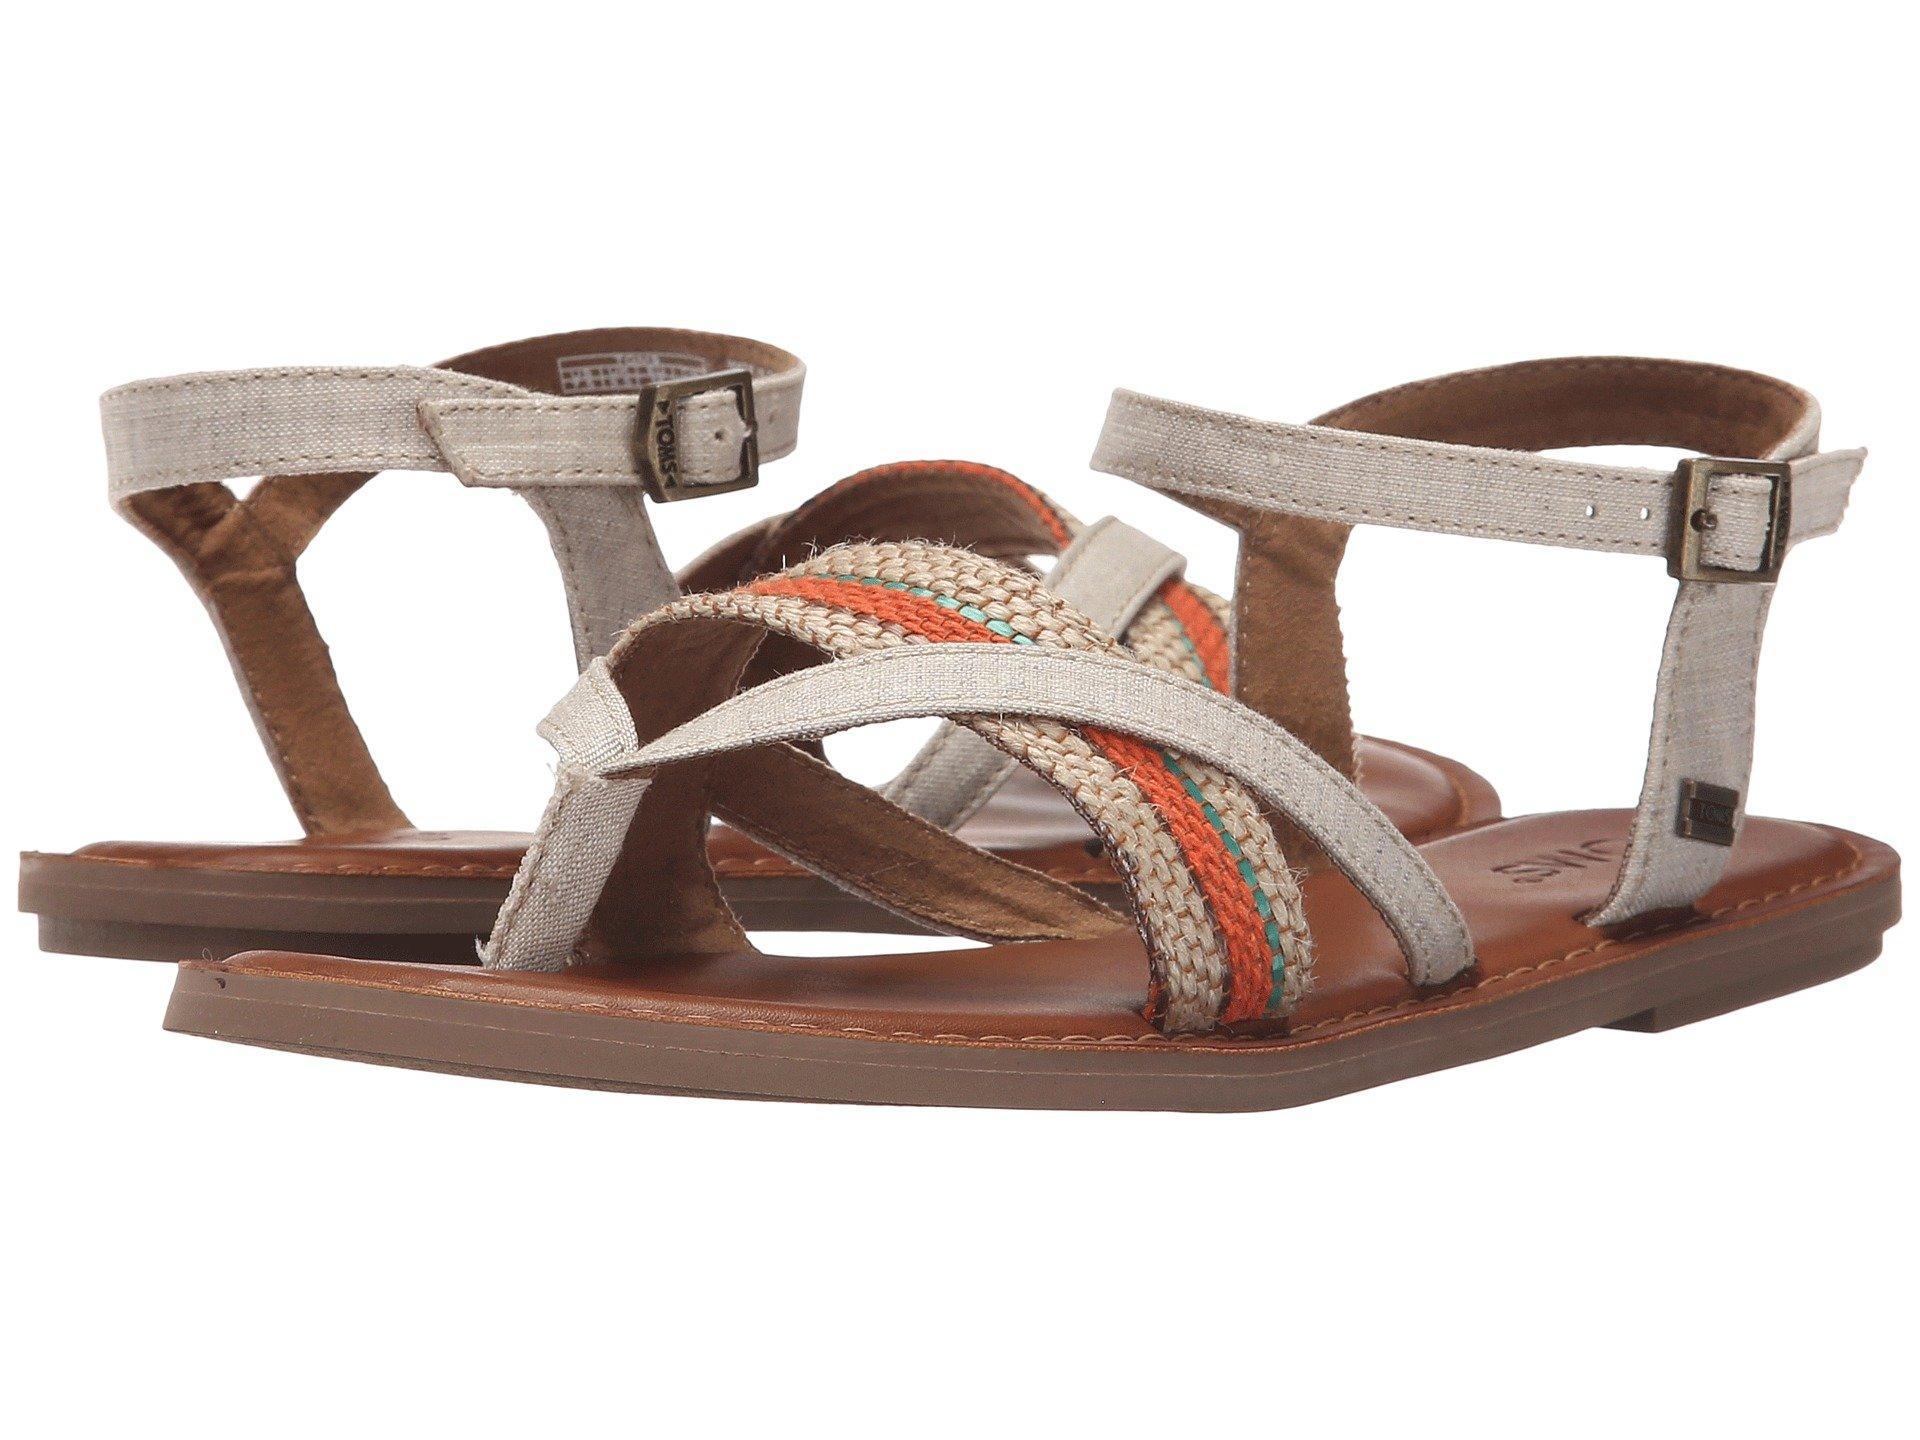 3820a7e06a93 Toms Lexie Sandal In Natural Multi Woven Stripe